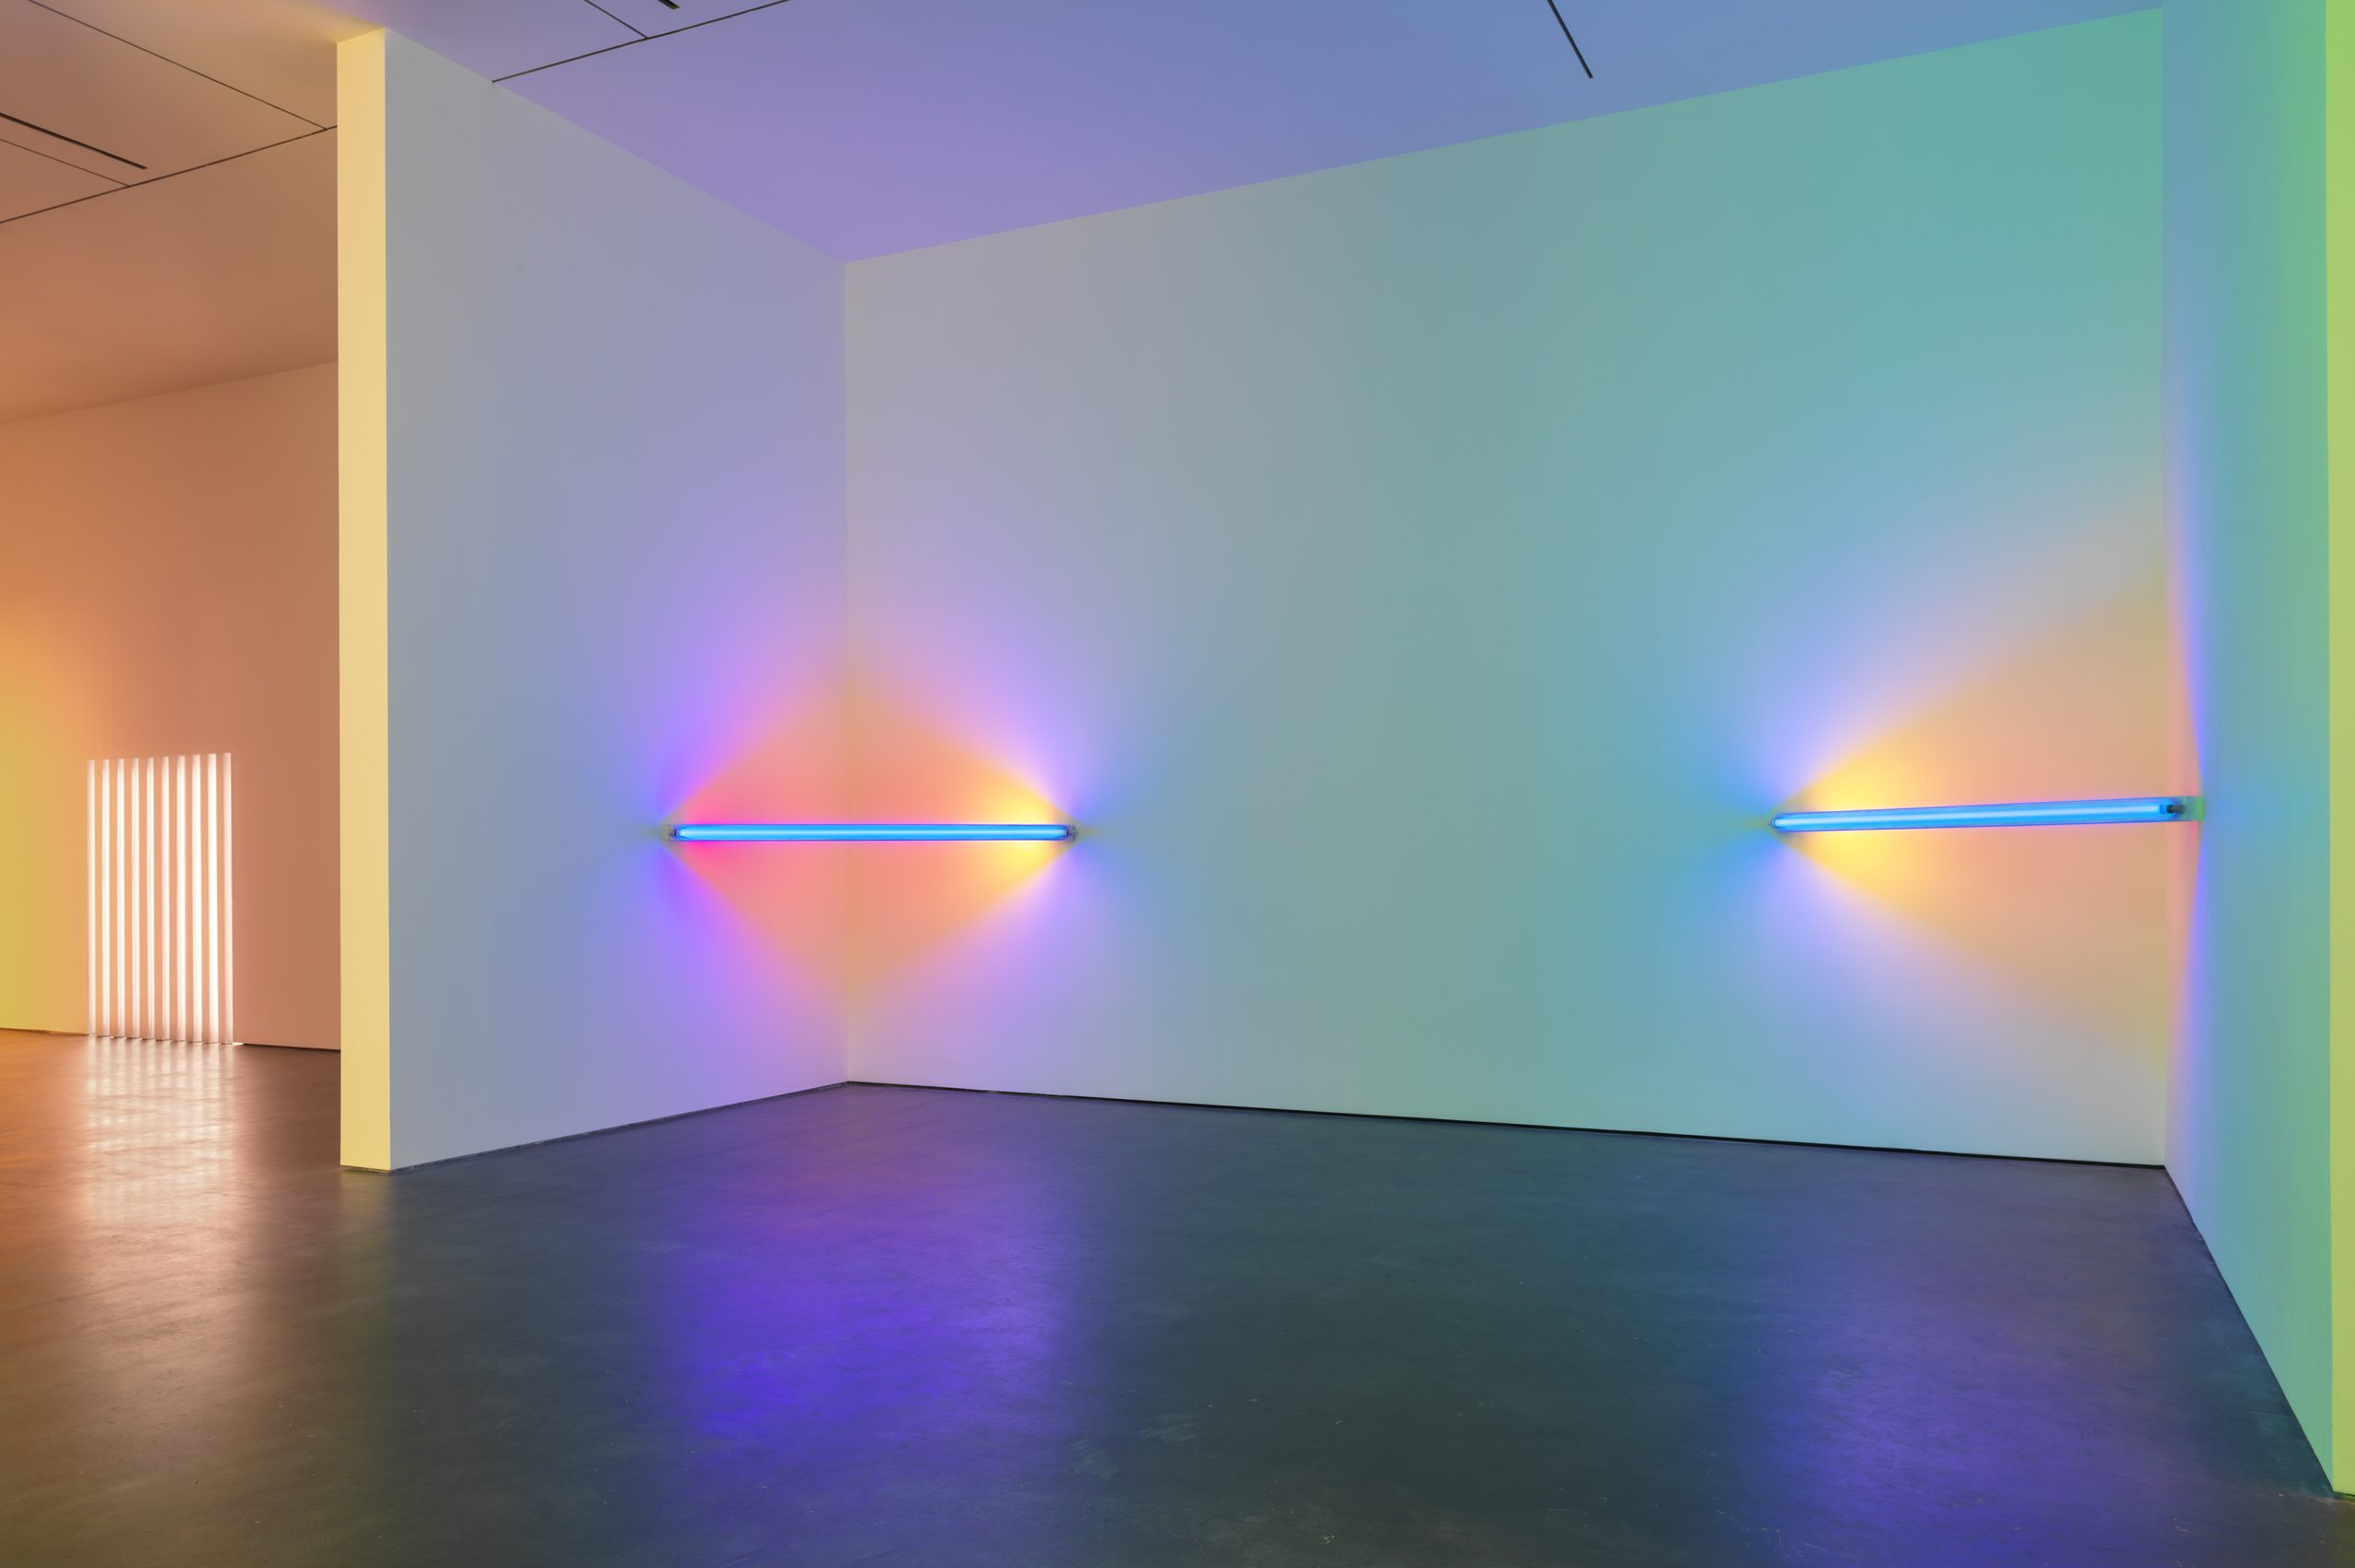 Light as Art: Corners, Barriers and Corridors - Dan Flavin